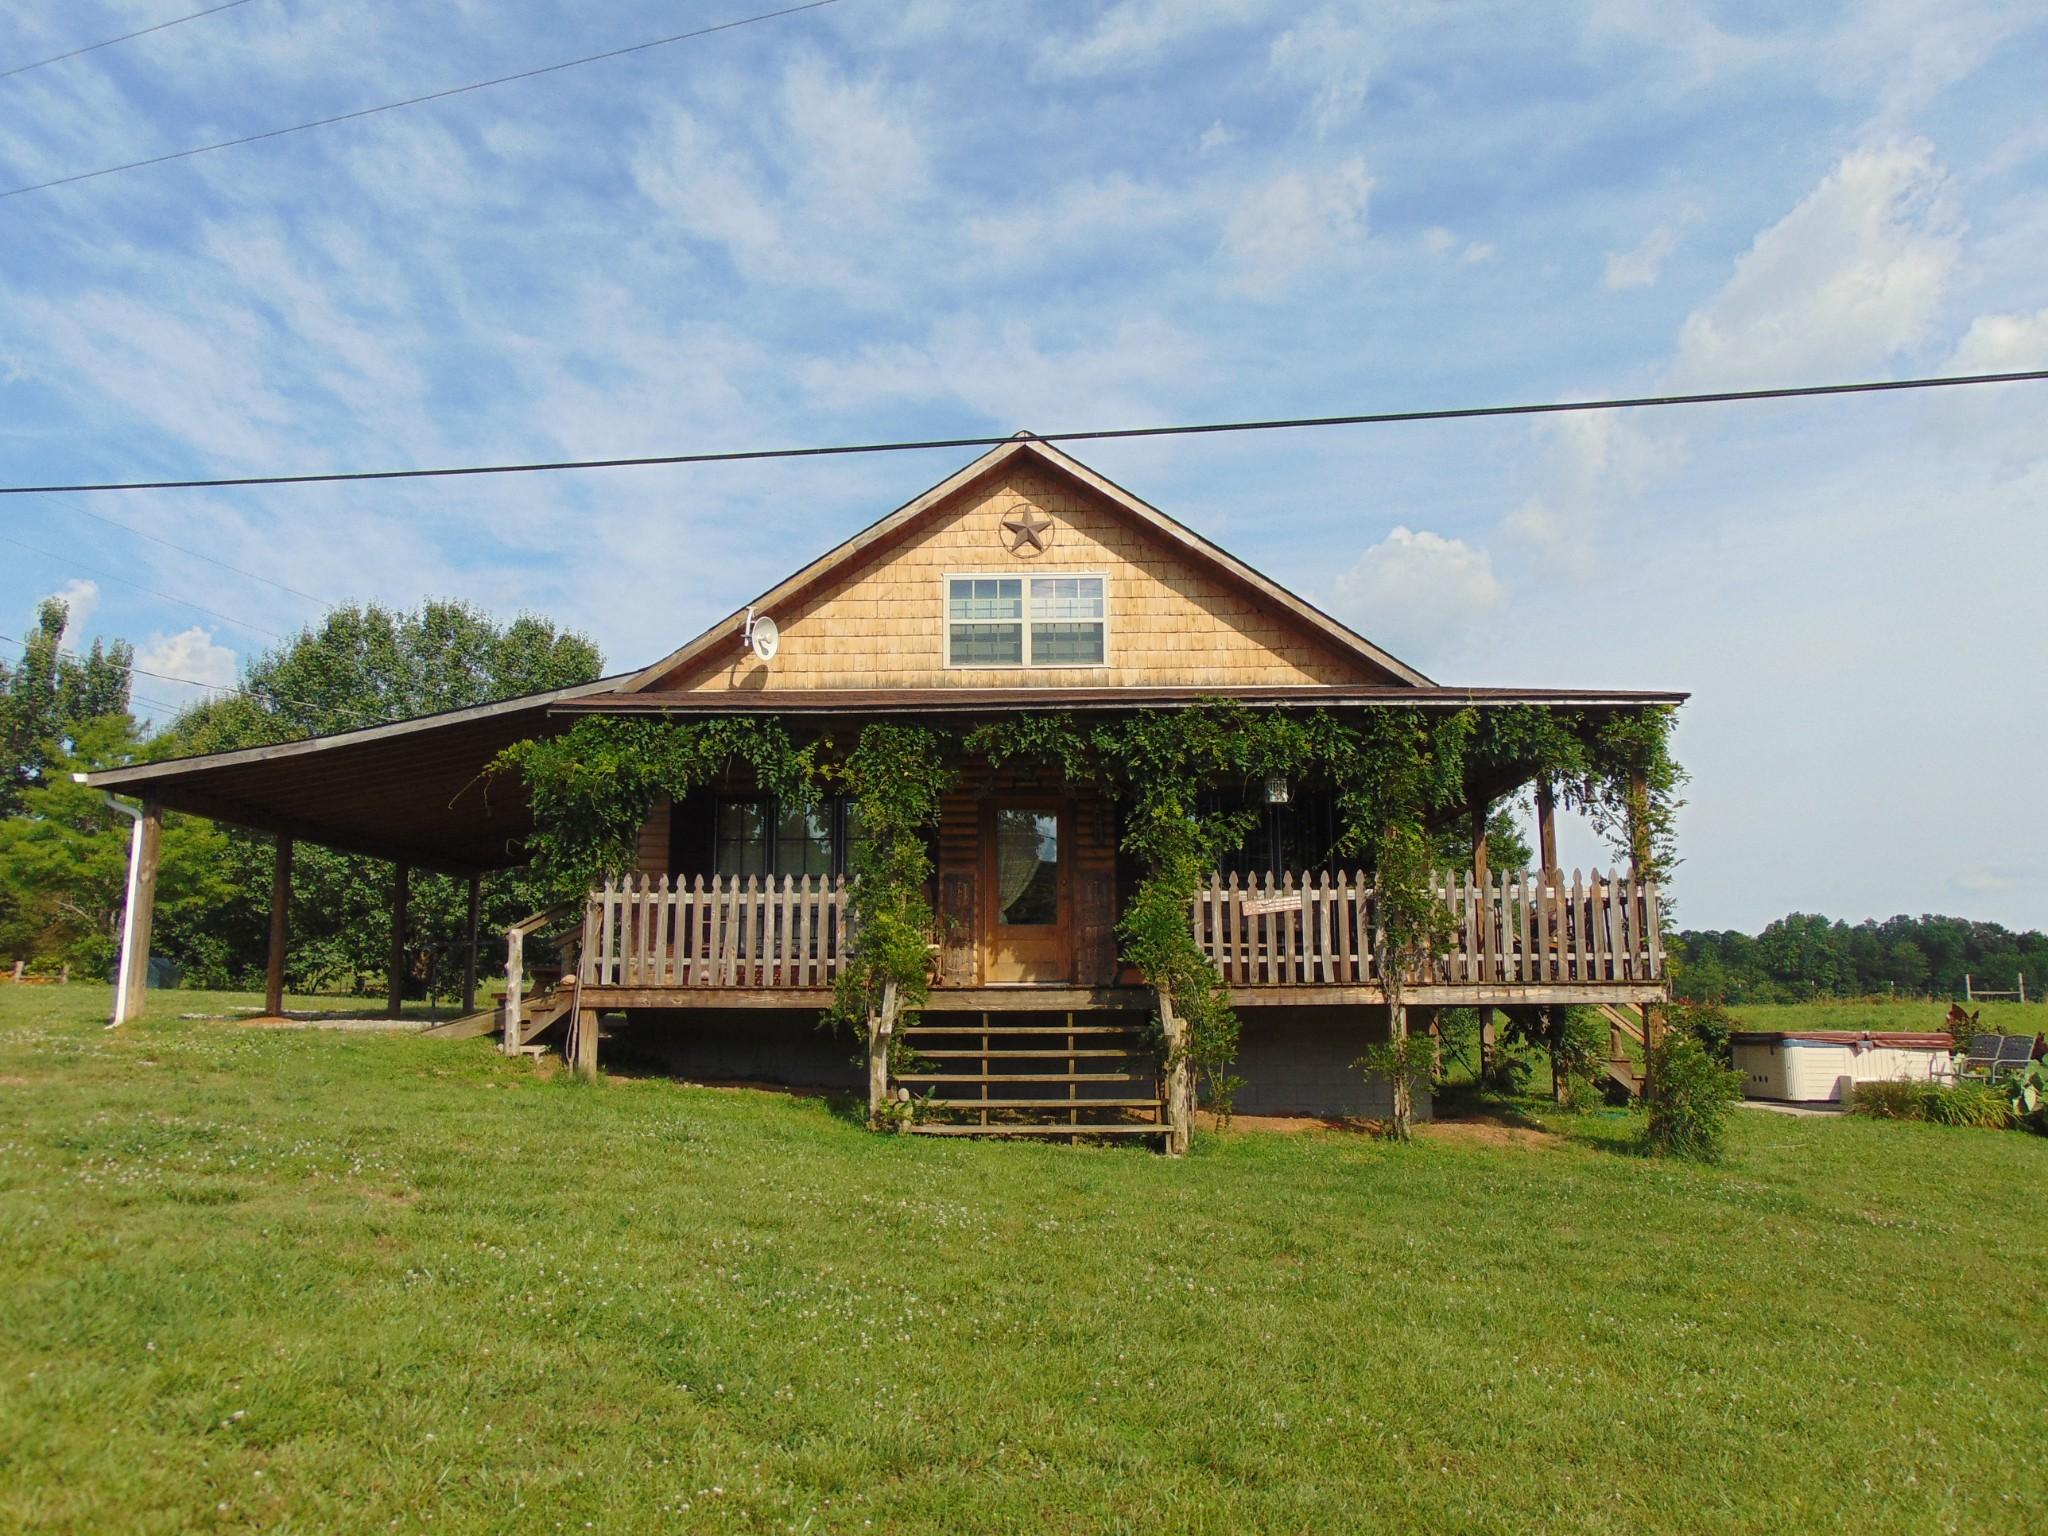 325 Sunny Brook Creek Rd, Lawrenceburg, TN 38464 - Lawrenceburg, TN real estate listing